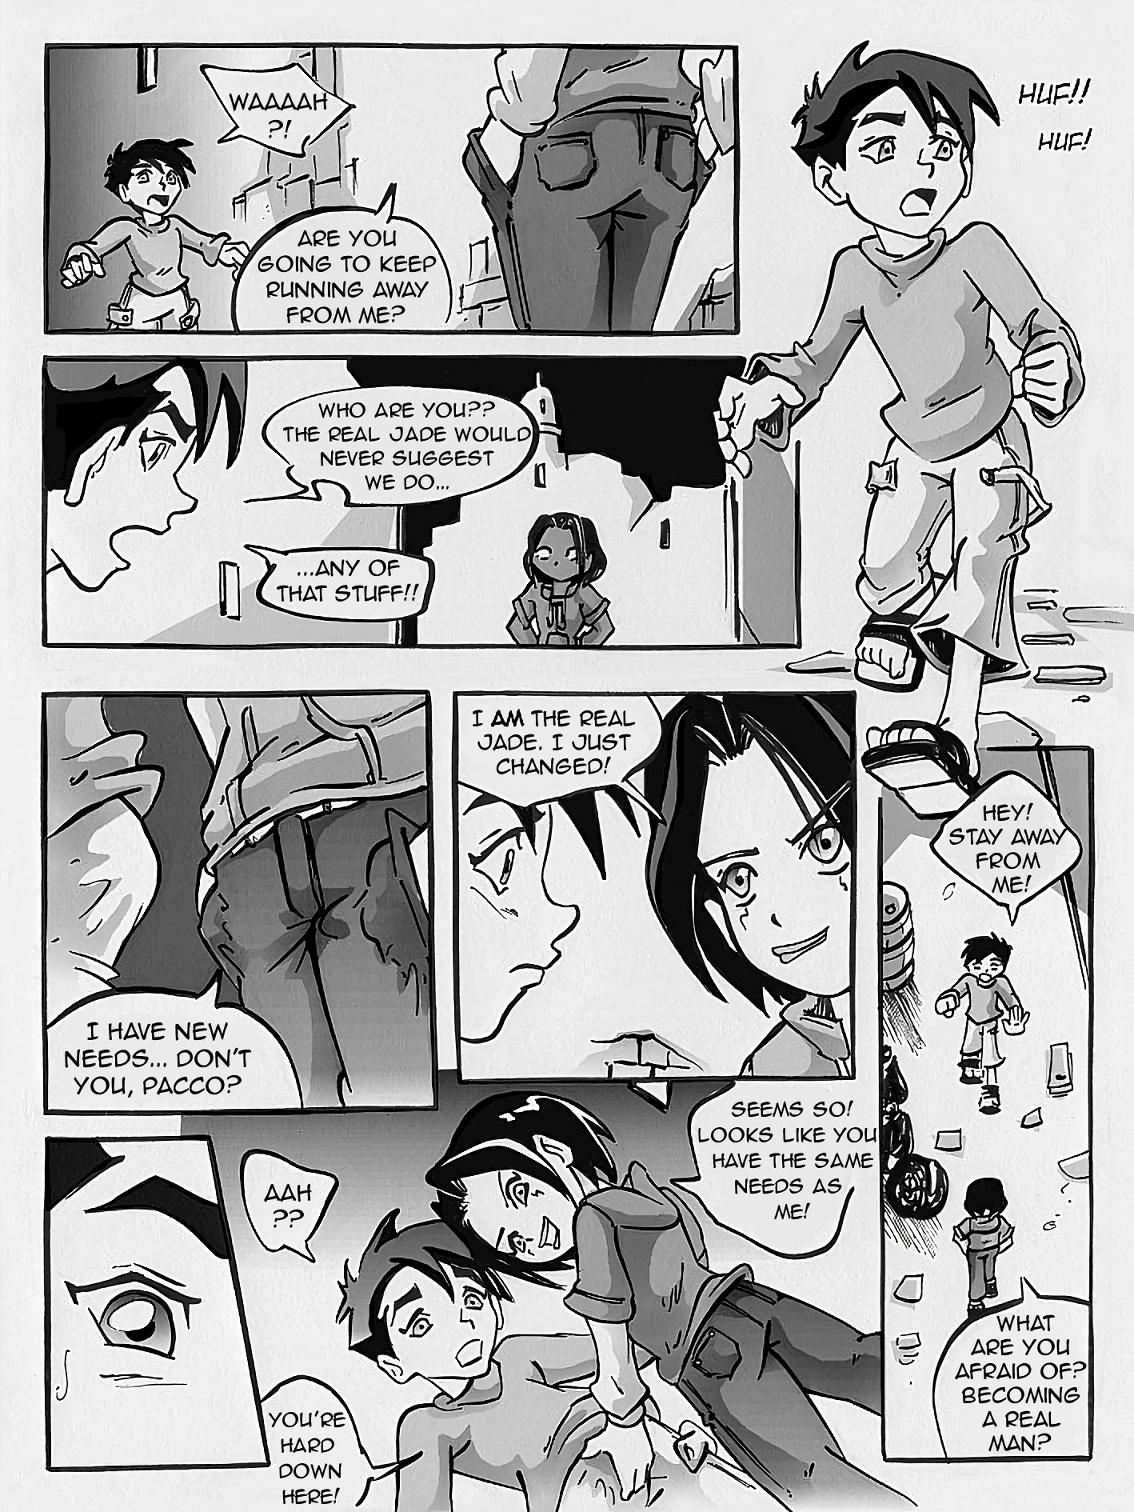 Jade Adventure porn comics Oral sex, BDSM, Bestiality, Blowjob, Creampie, Cum Shots, Cum Swallow, cunnilingus, fingering, Furry, Futanari, Group Sex, Lesbians, Lolicon, Masturbation, Rape, Sex and Magic, Straight, Straight Shota, X-Ray